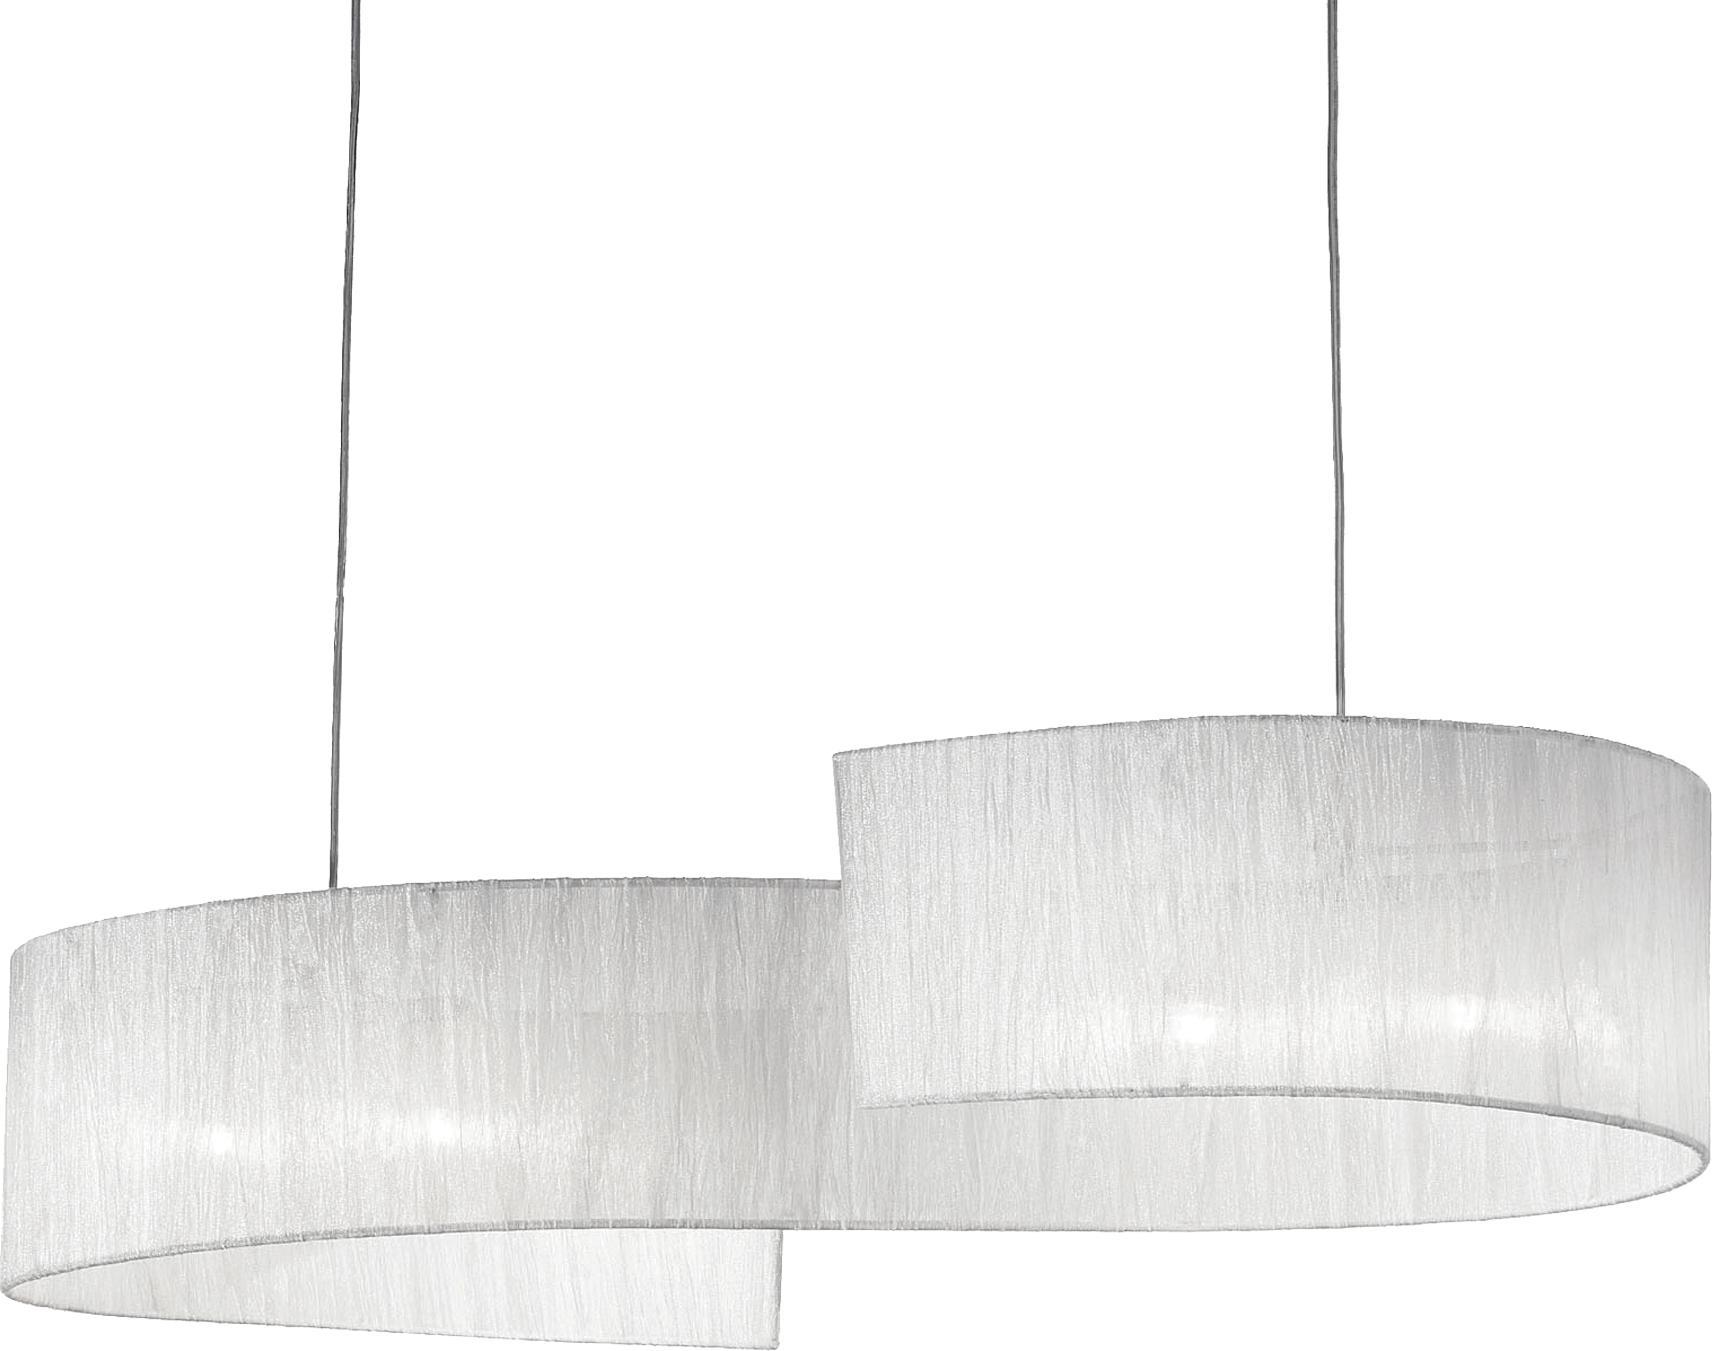 Ideal lux LED nastrino sp4 Pendelleuchten 4x4,5W 88631